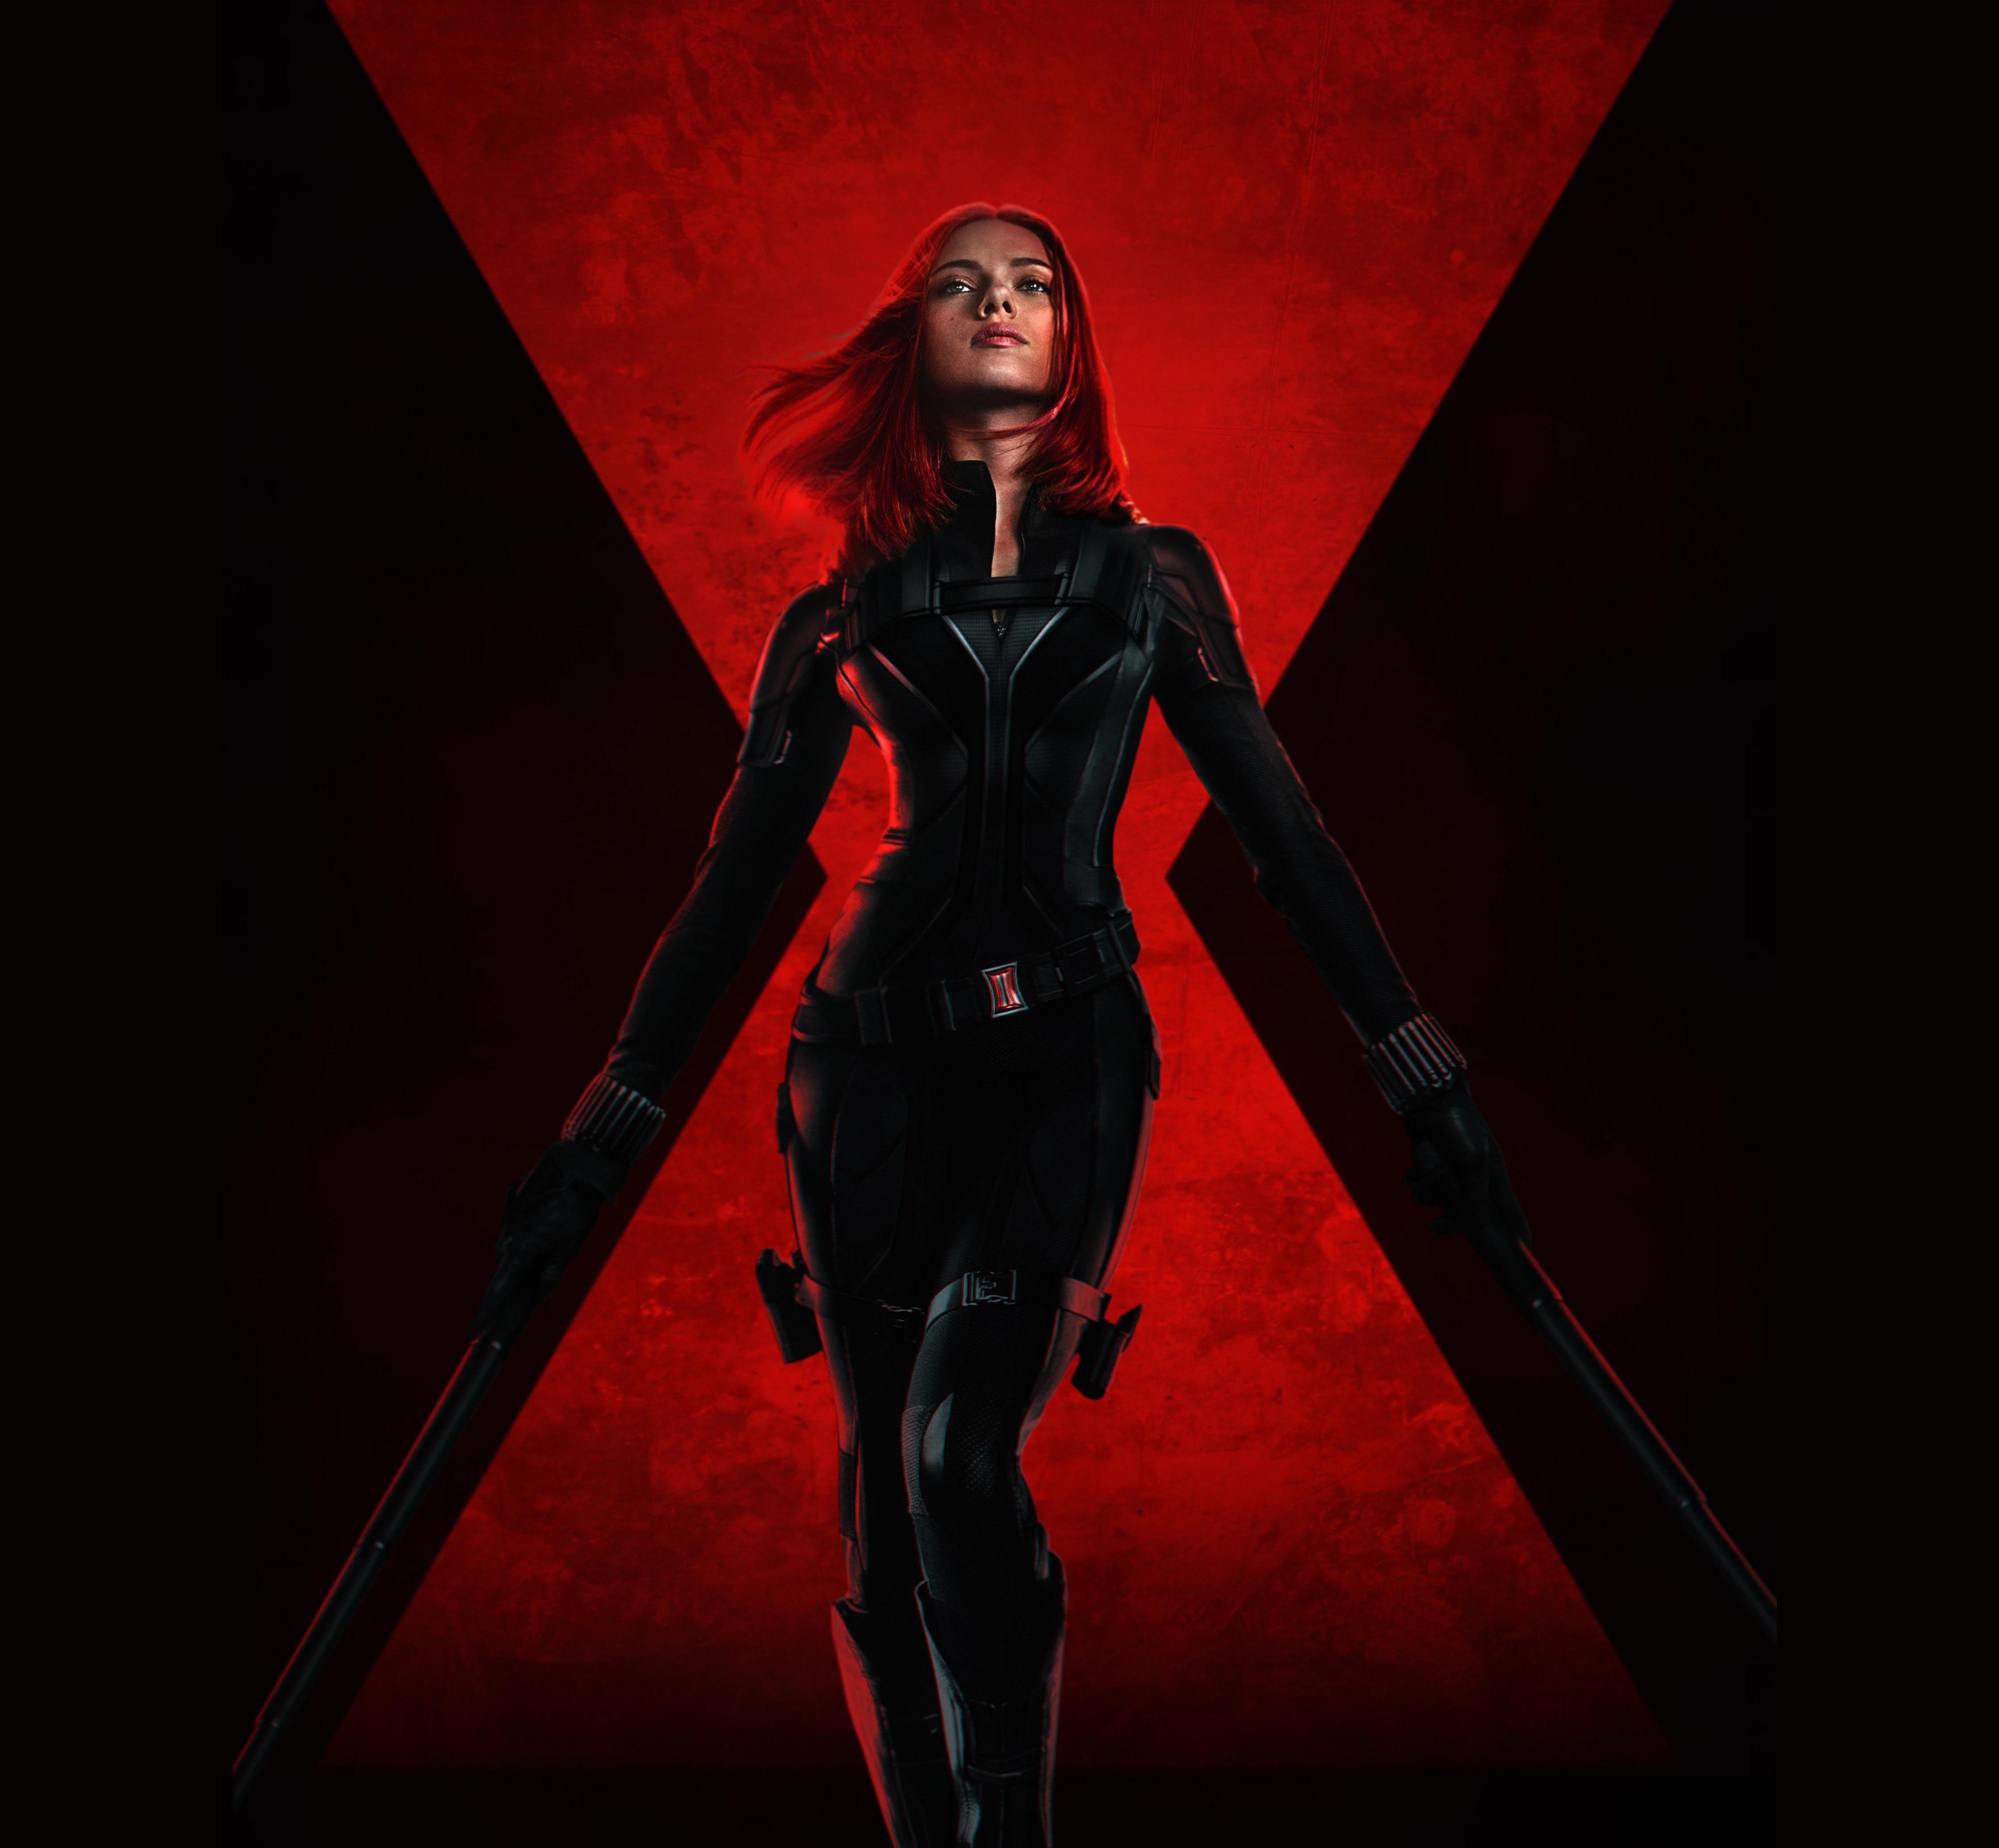 Black Widow 2020 Wallpaper HD Movies 4K Wallpapers Images 4500x4161